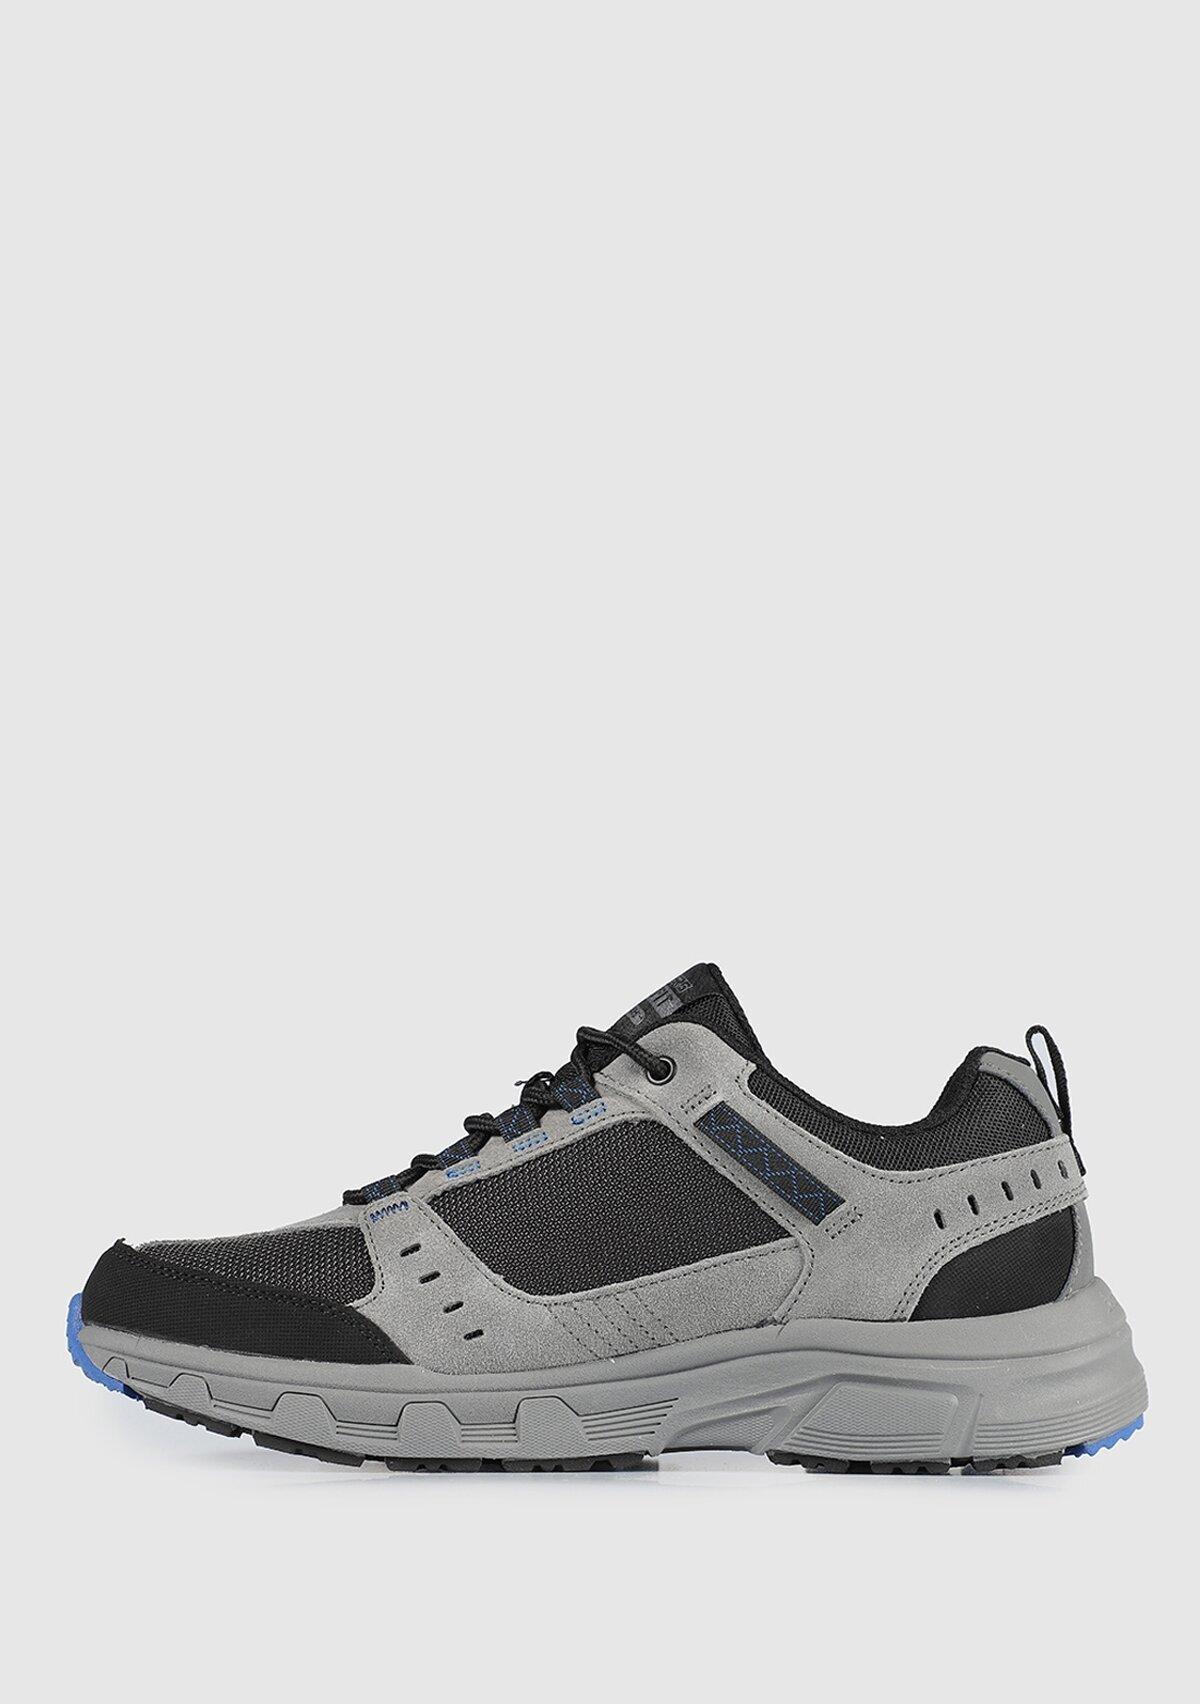 resm Oak Canyon Gri Erkek Sneaker 51893Ccbk